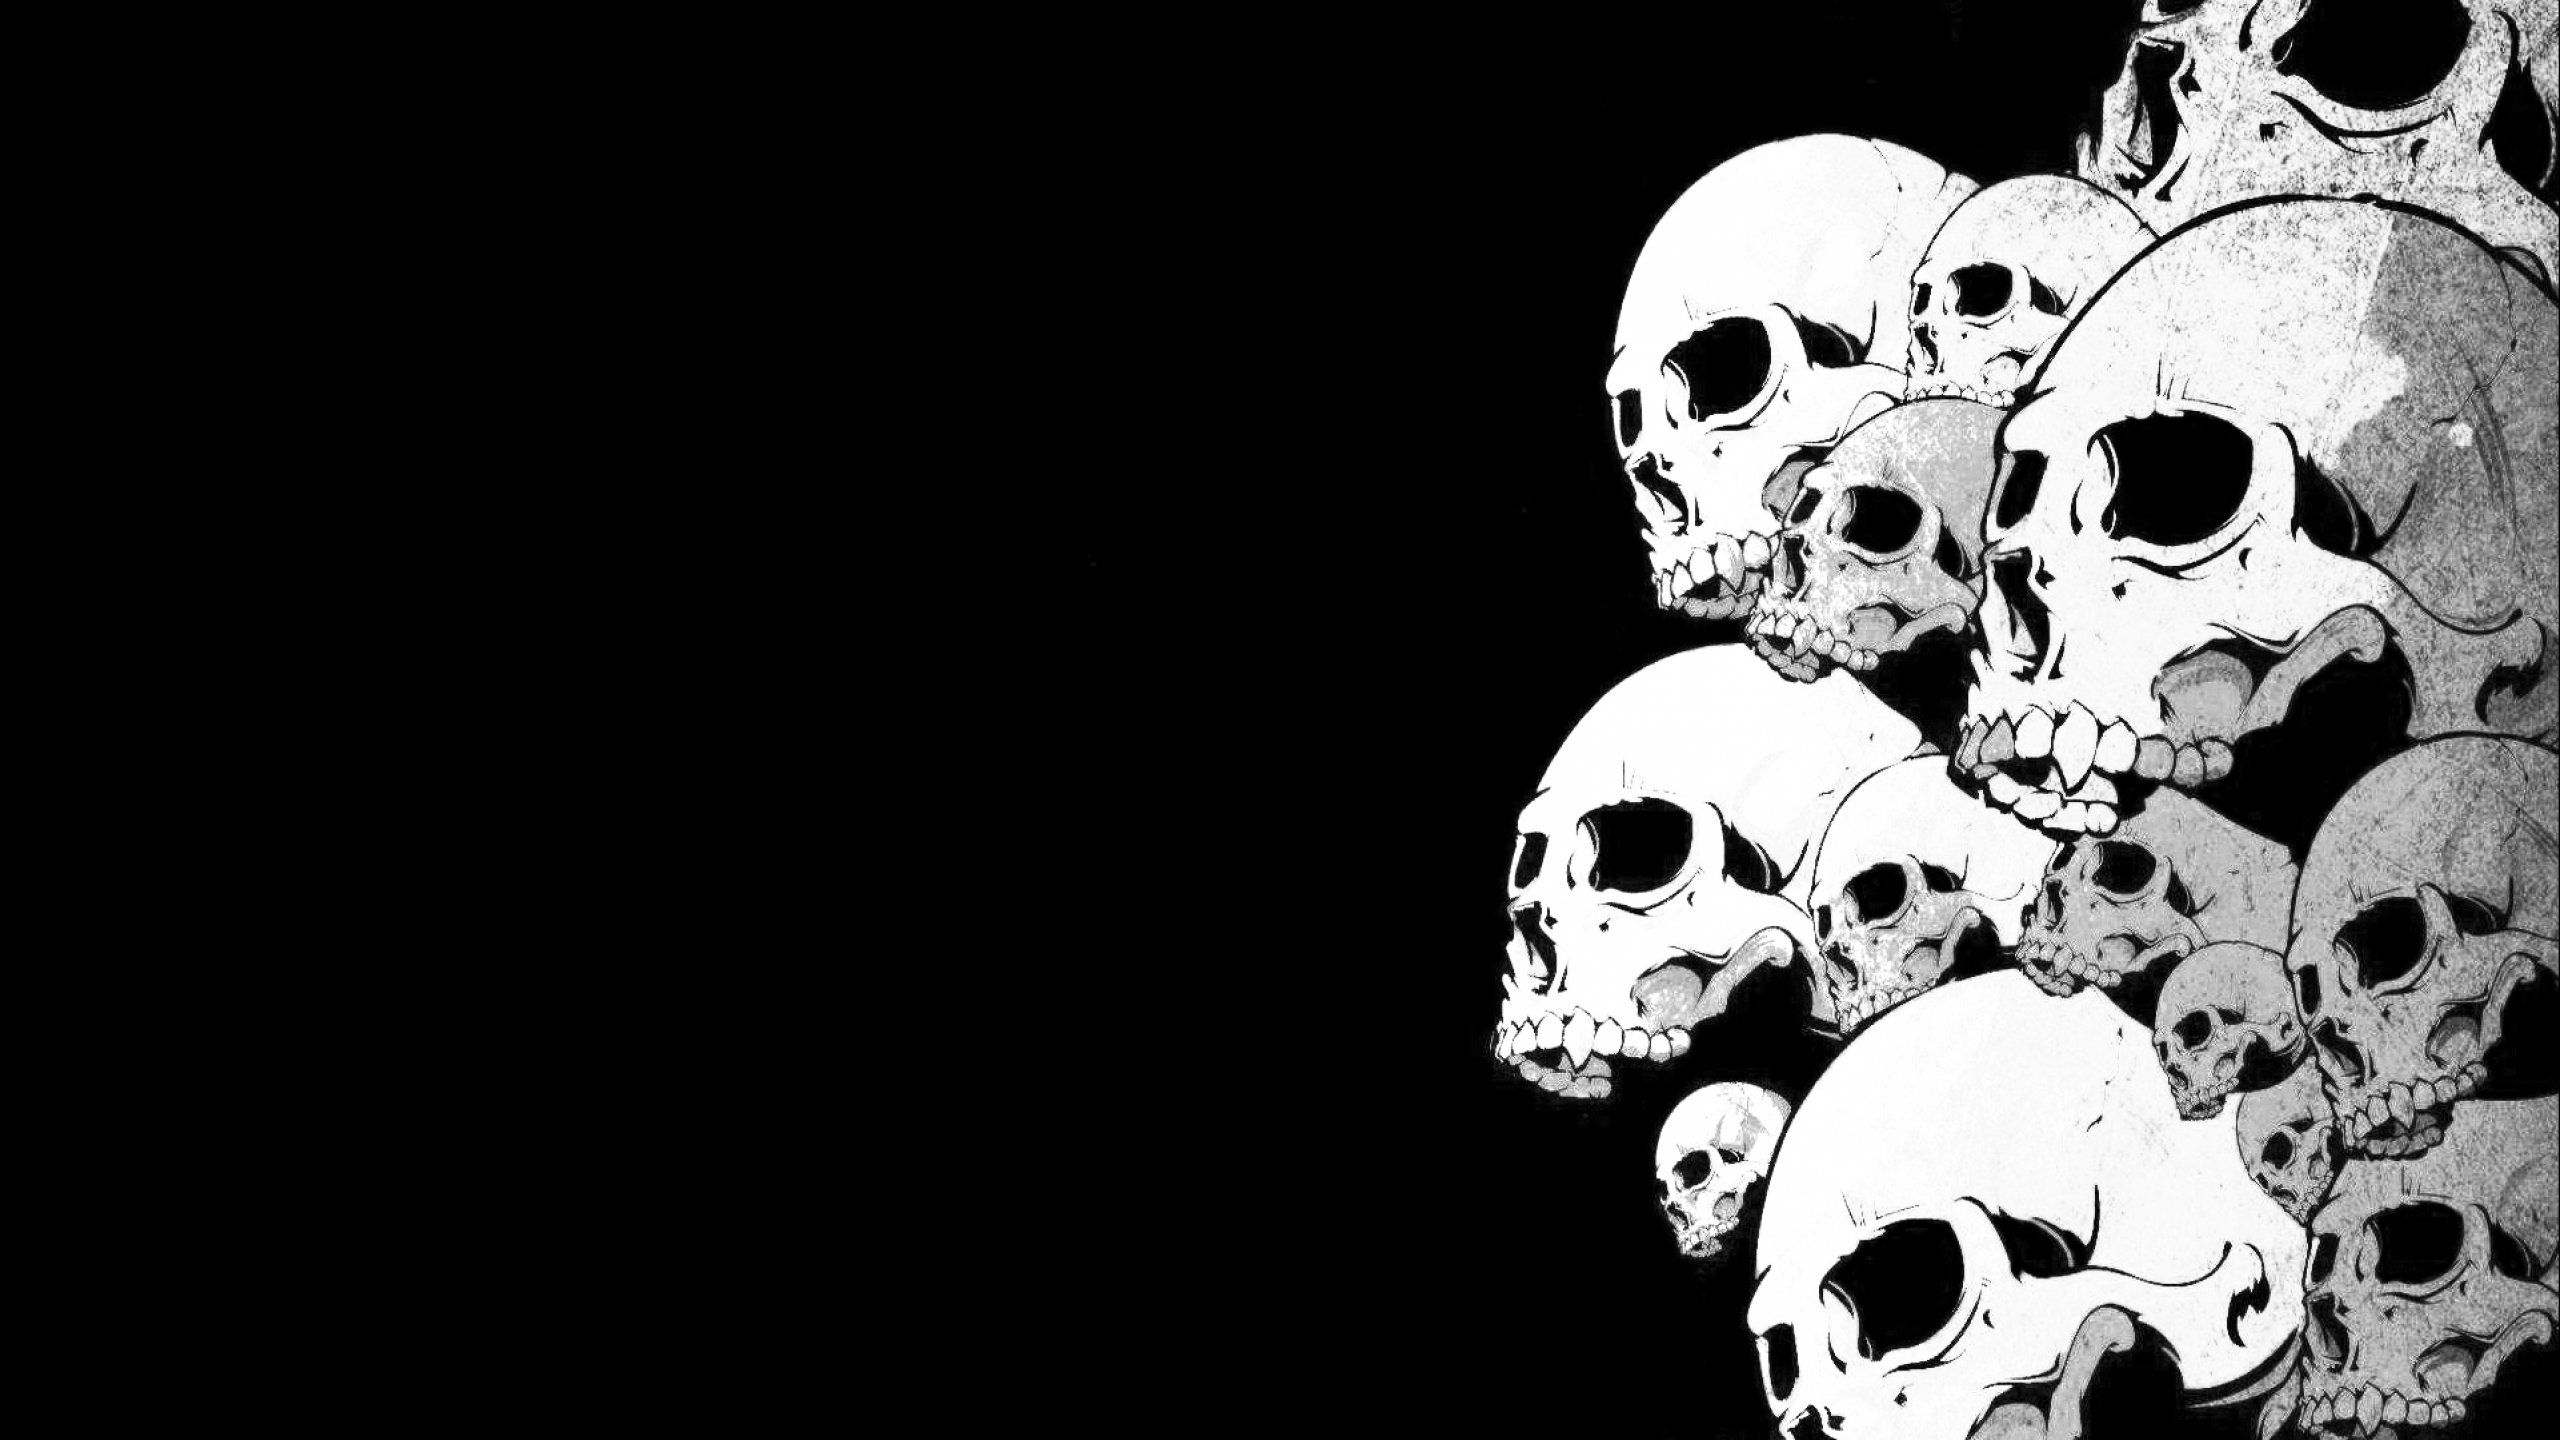 Dark Skull Evil Horror Skulls Art Artwork Skeleton D Wallpaper Skull Wallpaper Laptop Wallpaper Widescreen Wallpaper